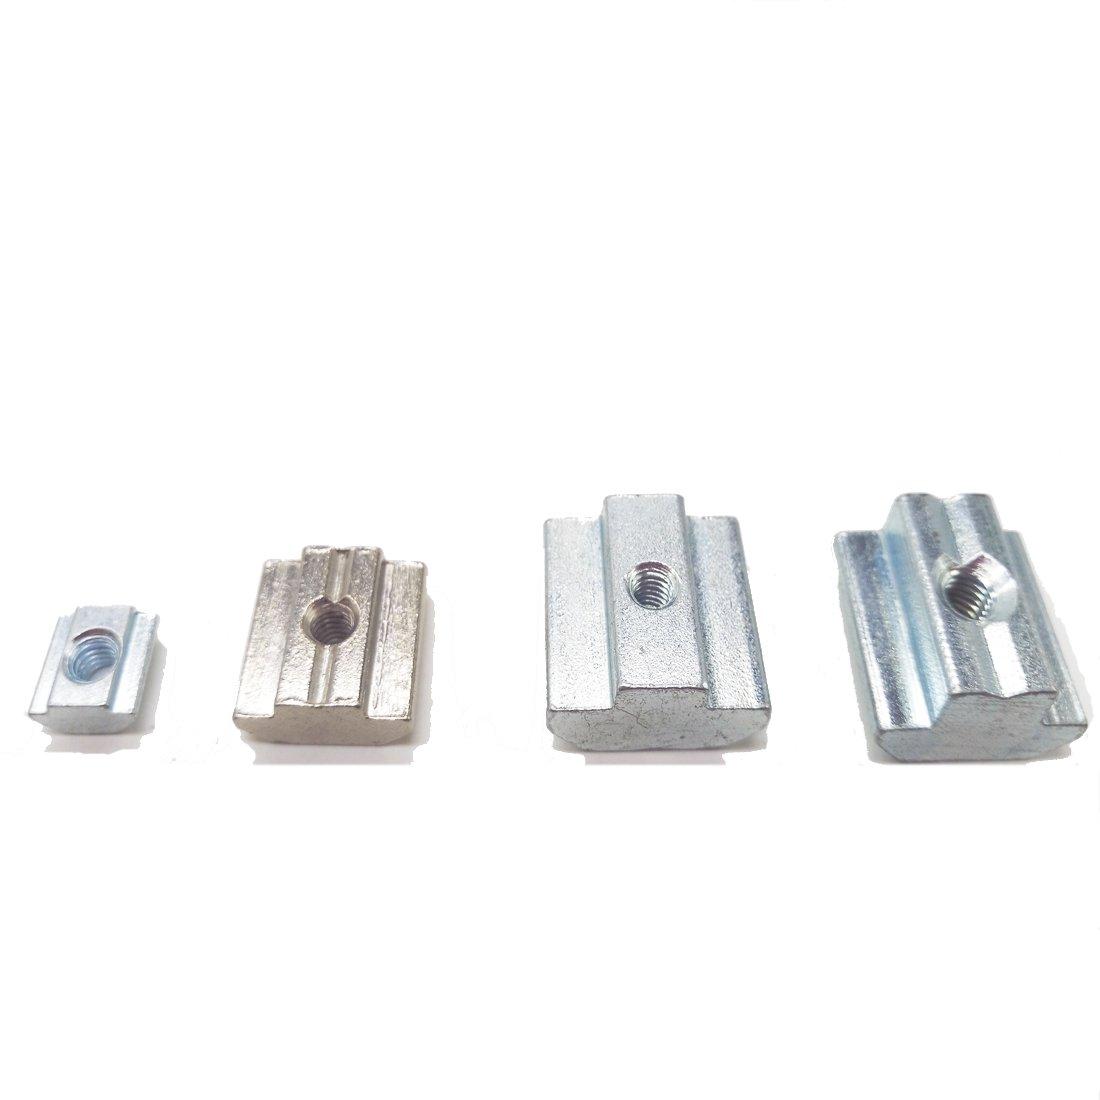 10PCS T Sliding Nut Zinc Coated Plate 45 Series M8 Aluminum Thread Diameter 10MM CNC